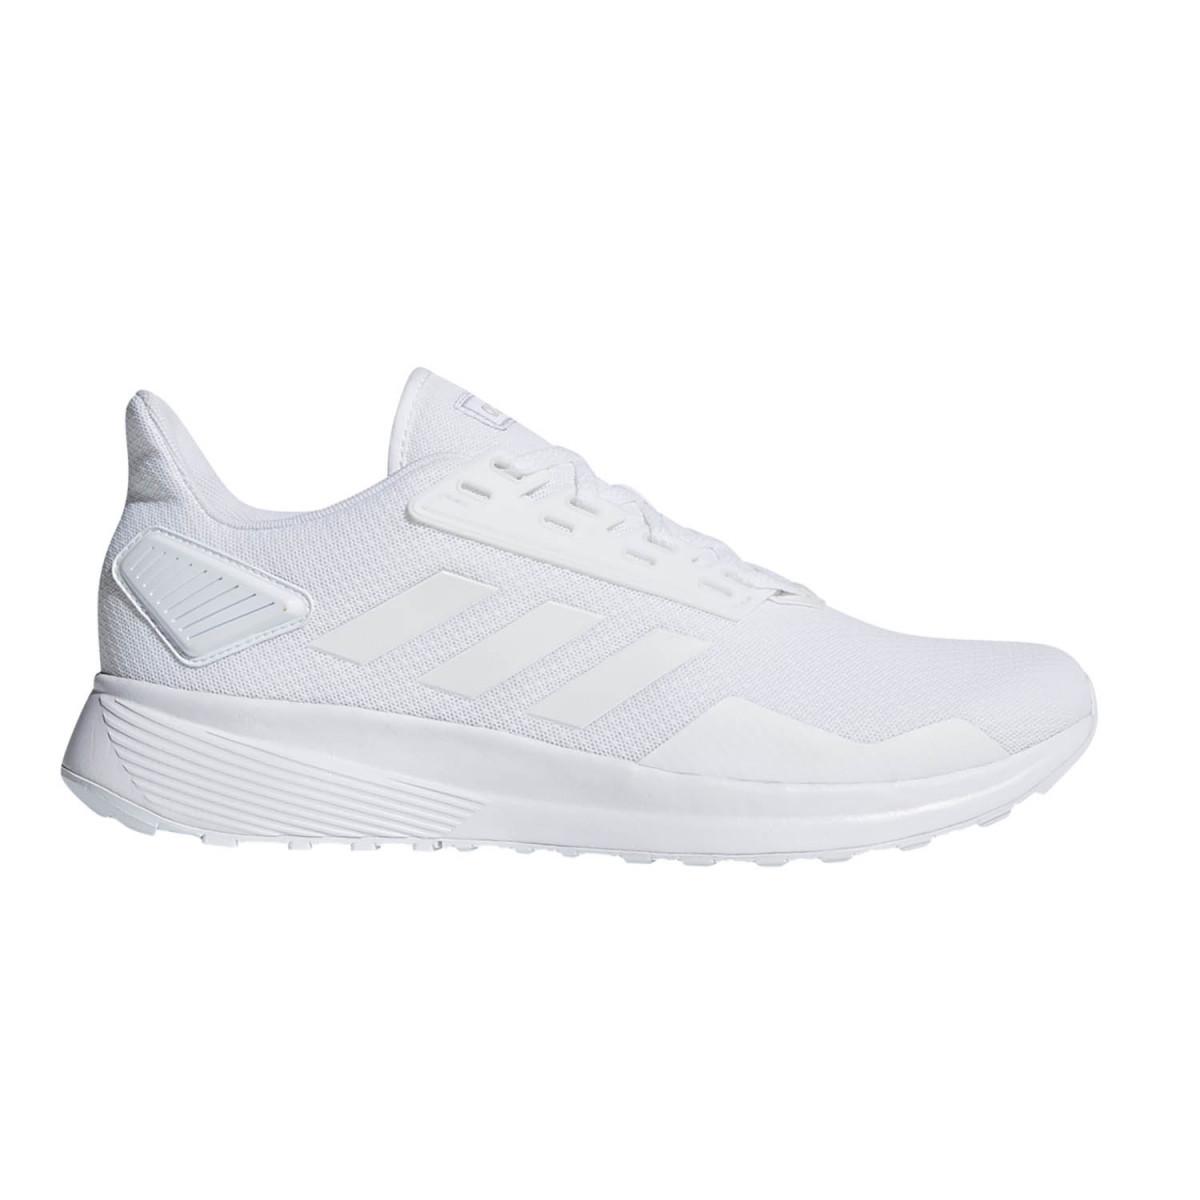 Running 9 Hombre Zapatillas Duramo Adidas WHq8wTnYRx 4d743d5752b